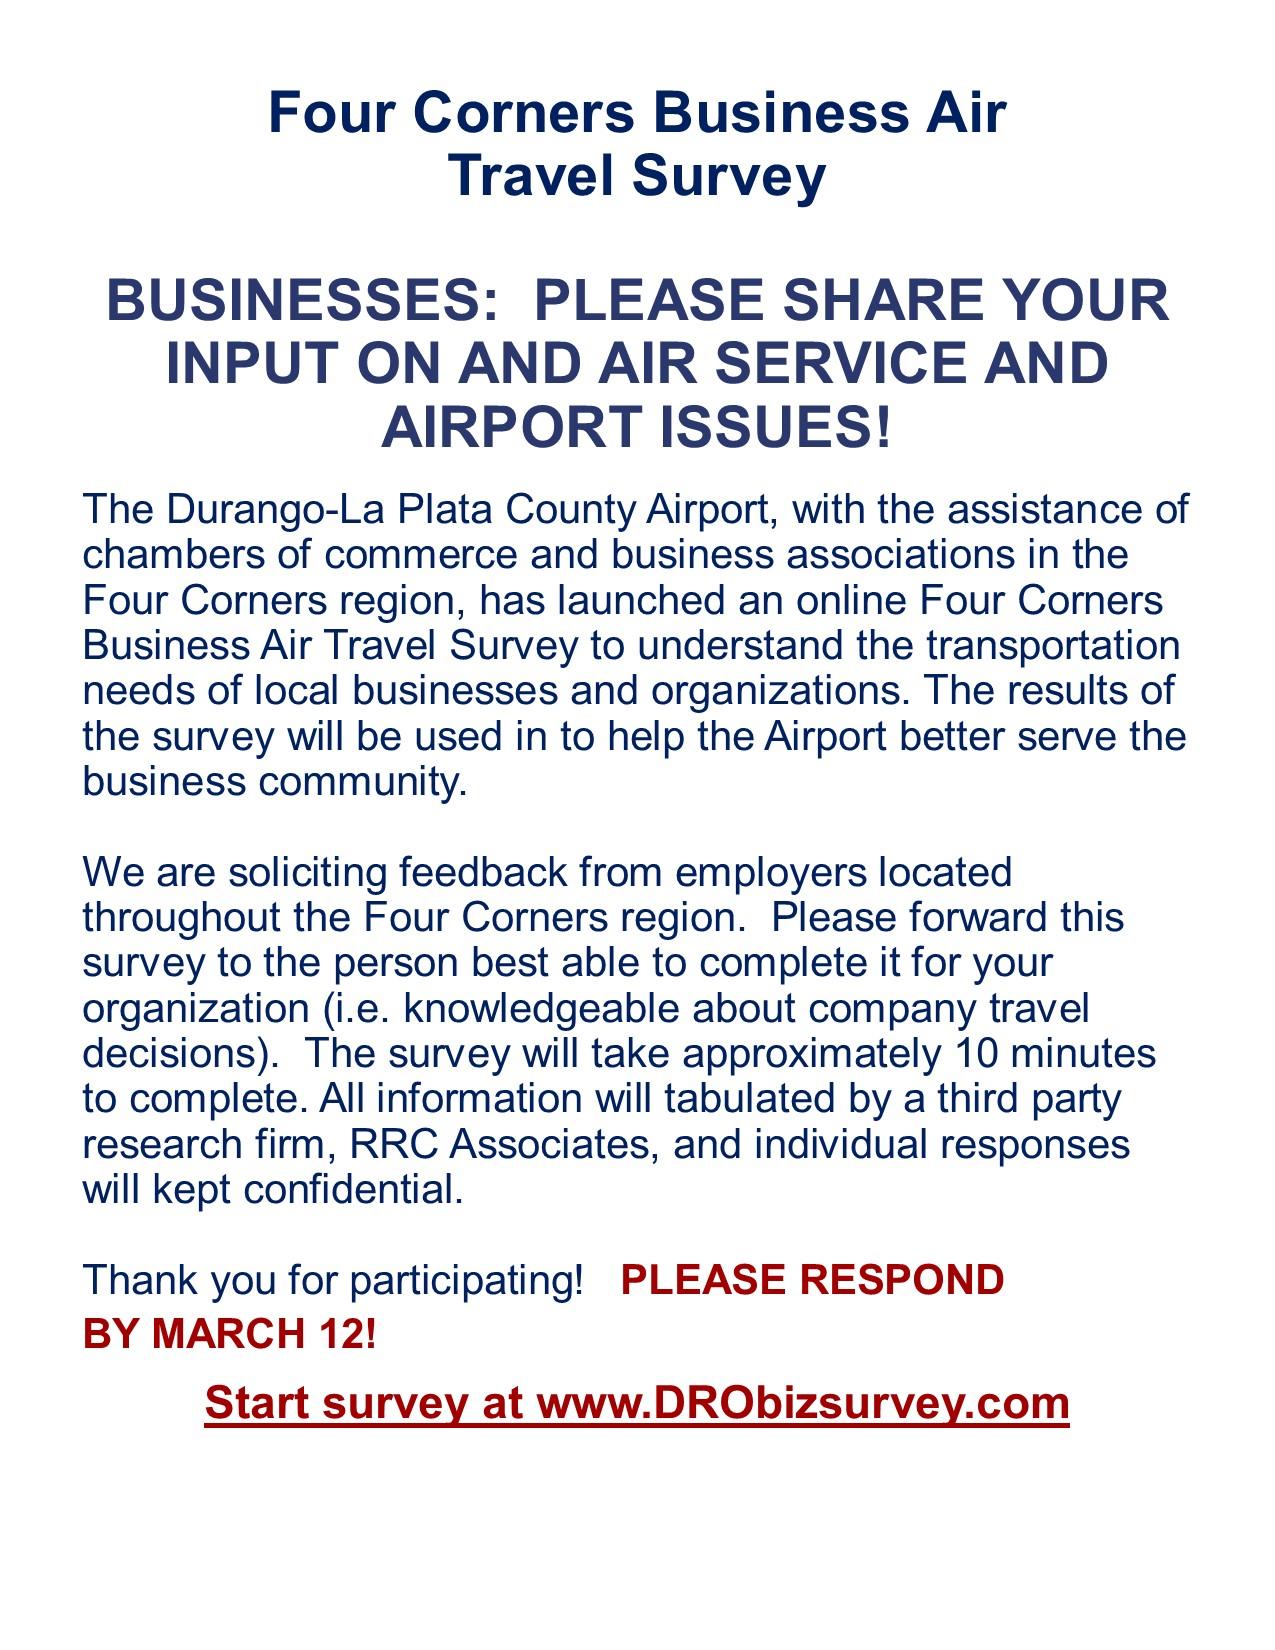 Four Corners Business Air Travel Survey